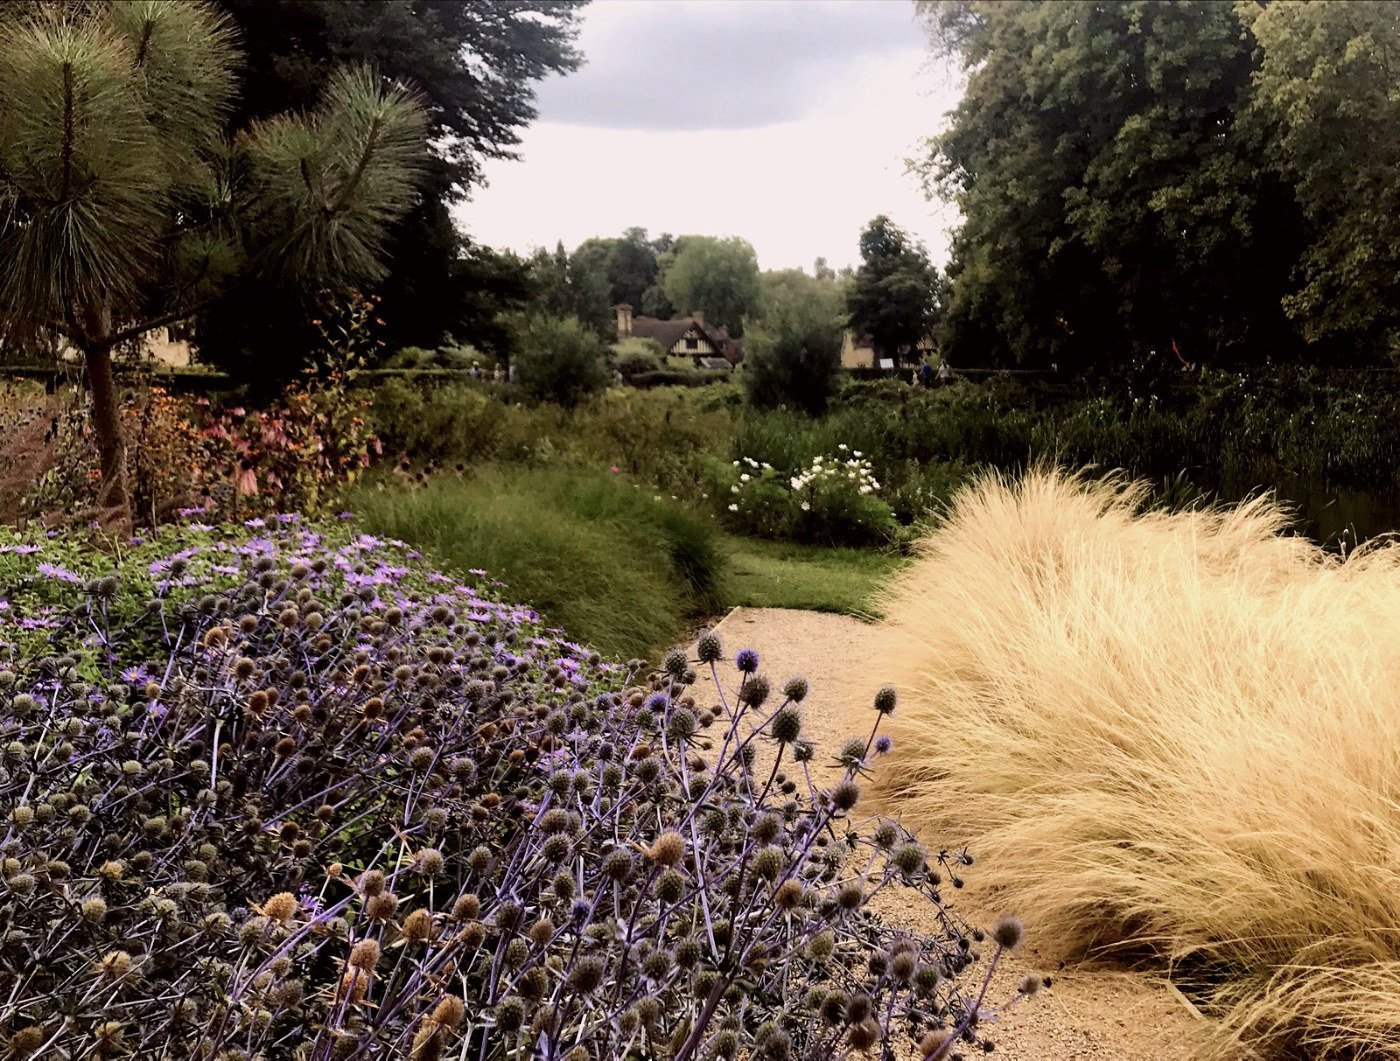 Echniops, Faith Garden